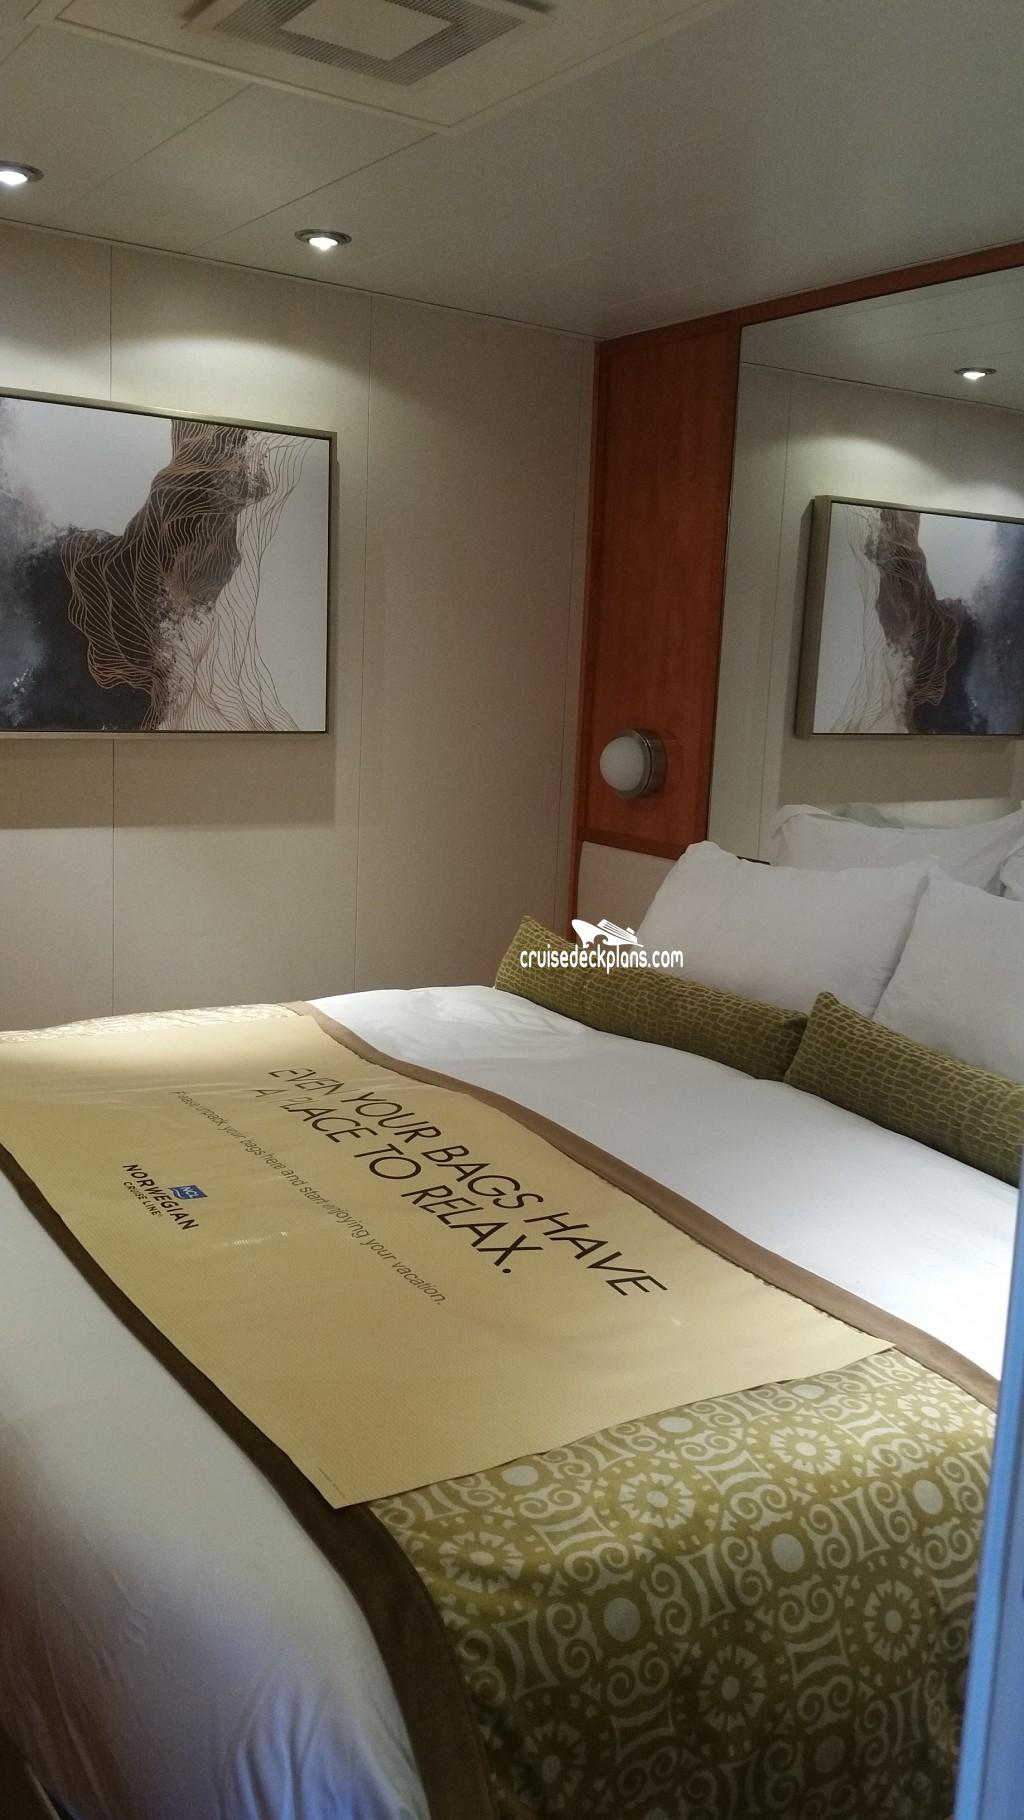 2 Bedroom Suites Portland Oregon: Pride Of America 2-Bedroom Family Suite Stateroom